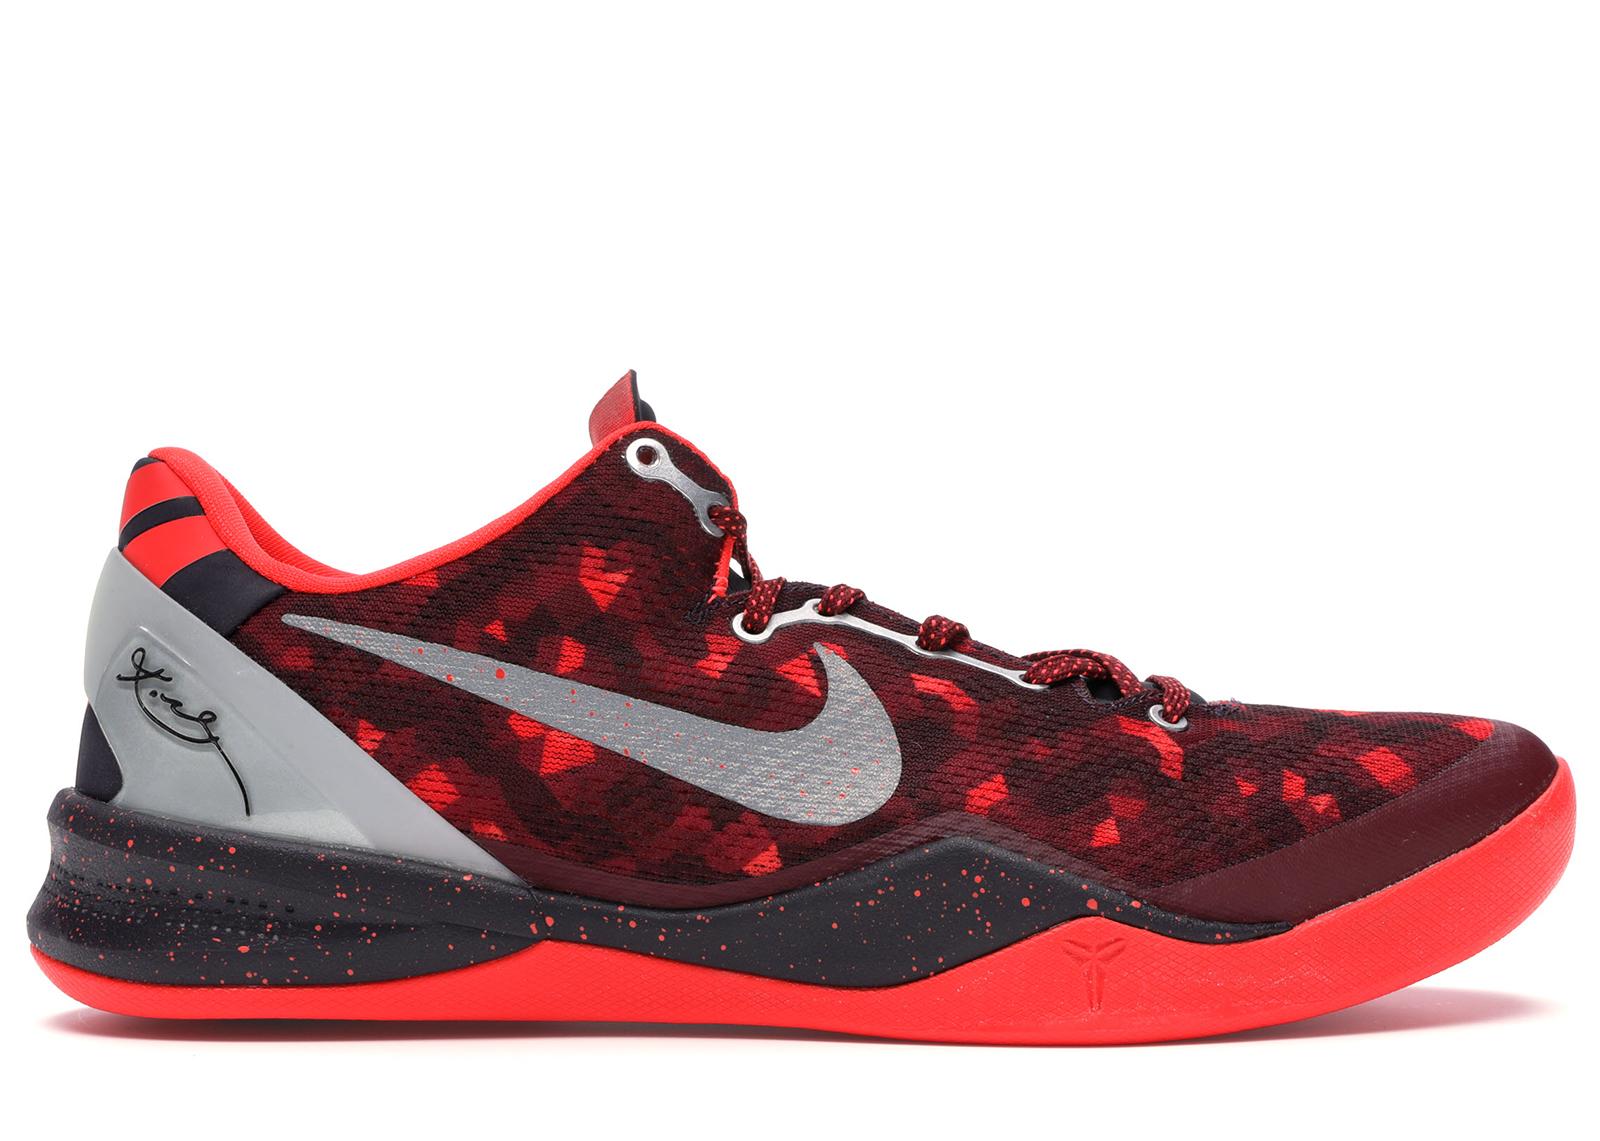 Nike Kobe 8 Year of the Snake (Port